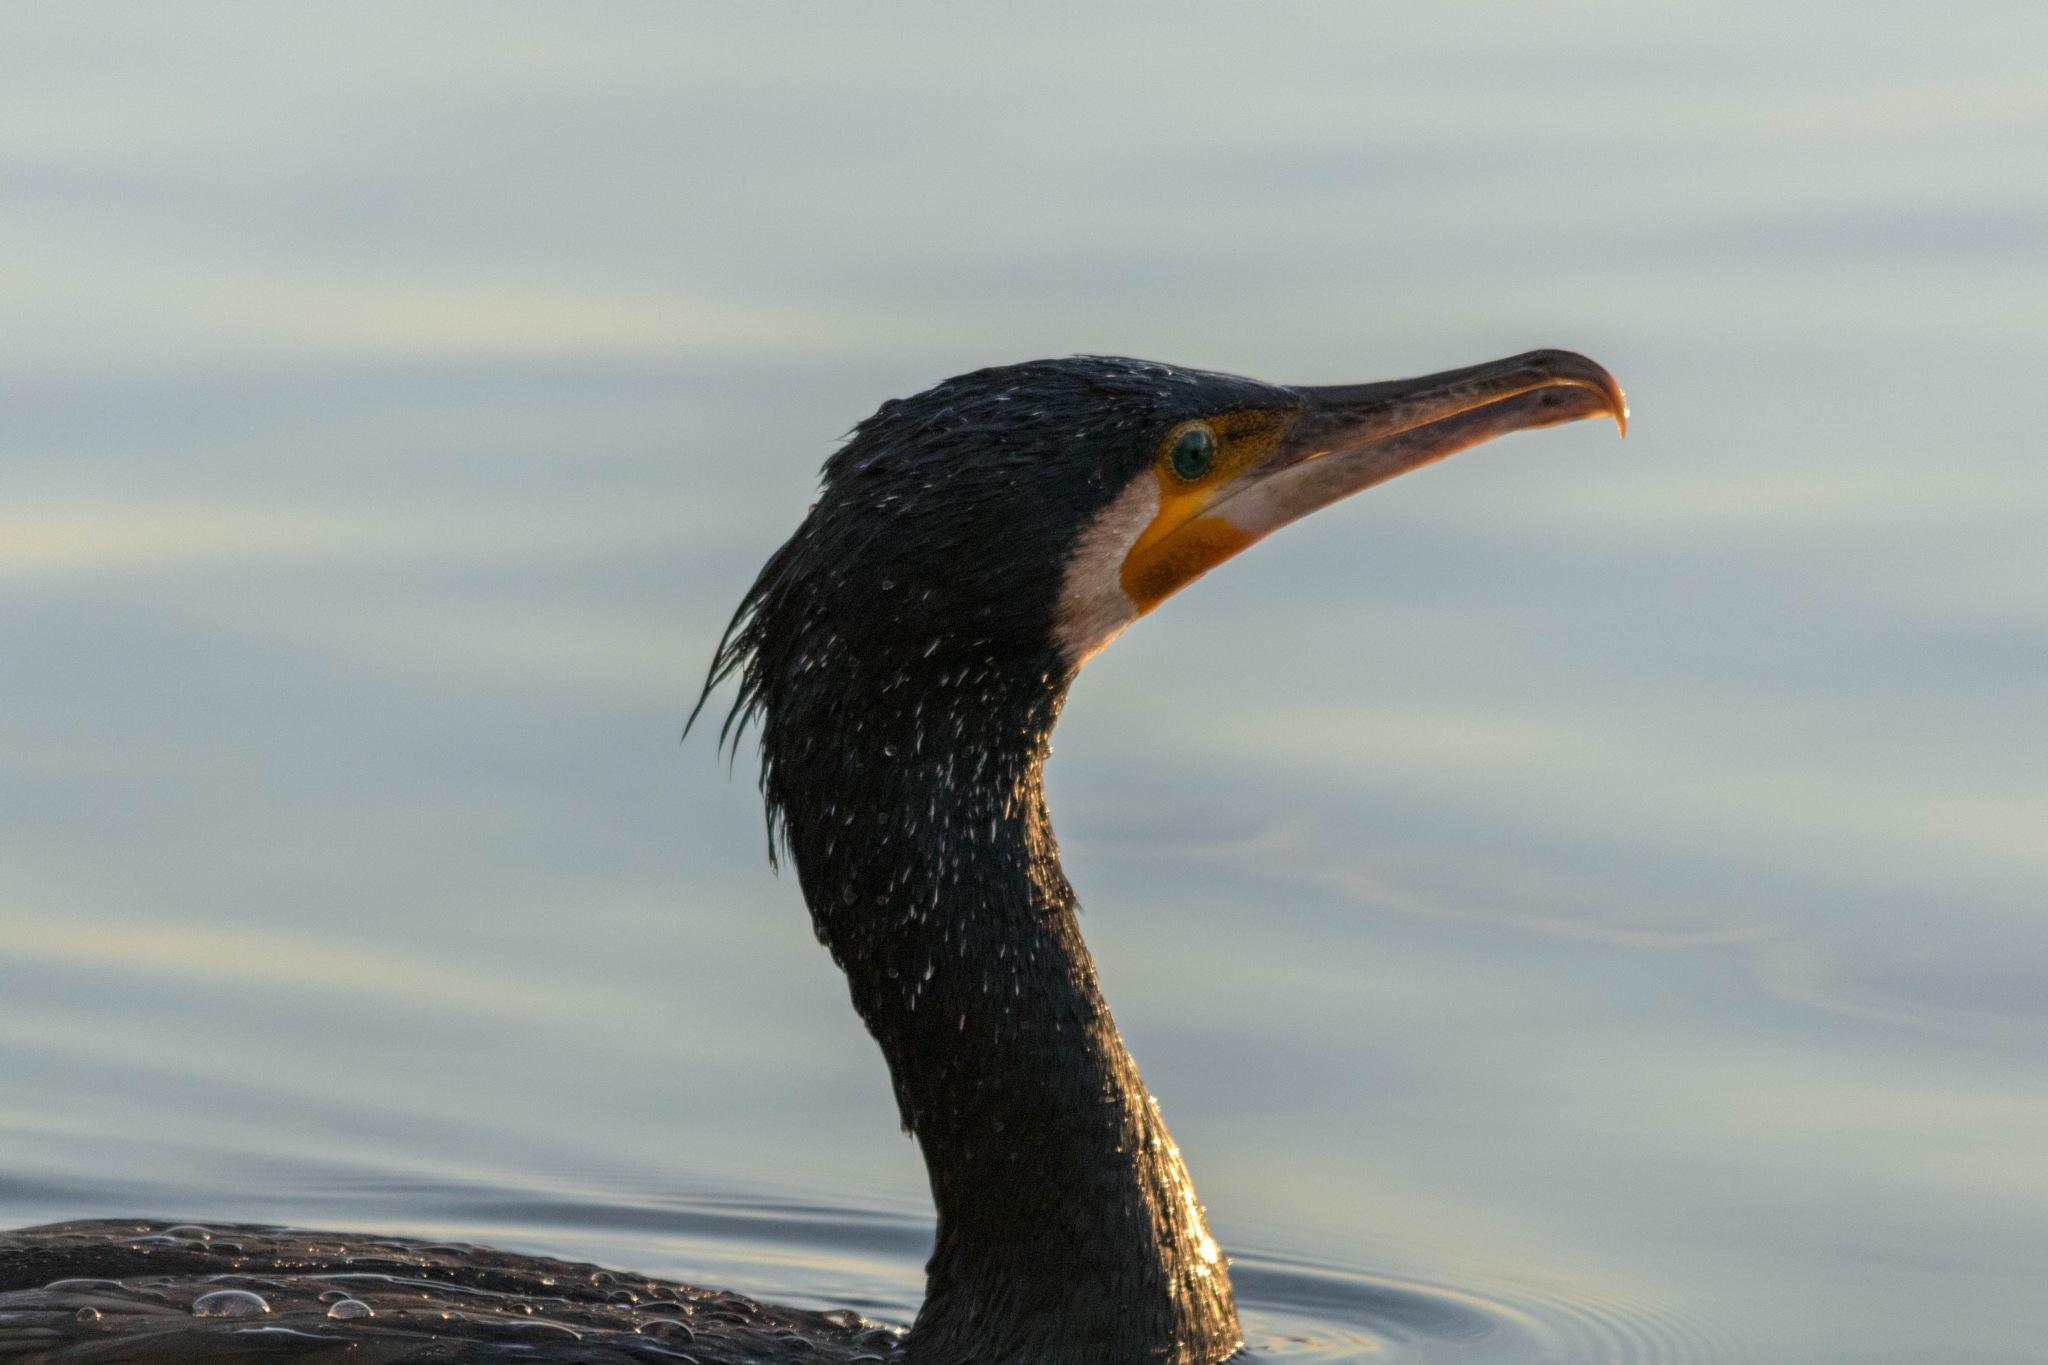 Cormorant by Andrea Prestileo